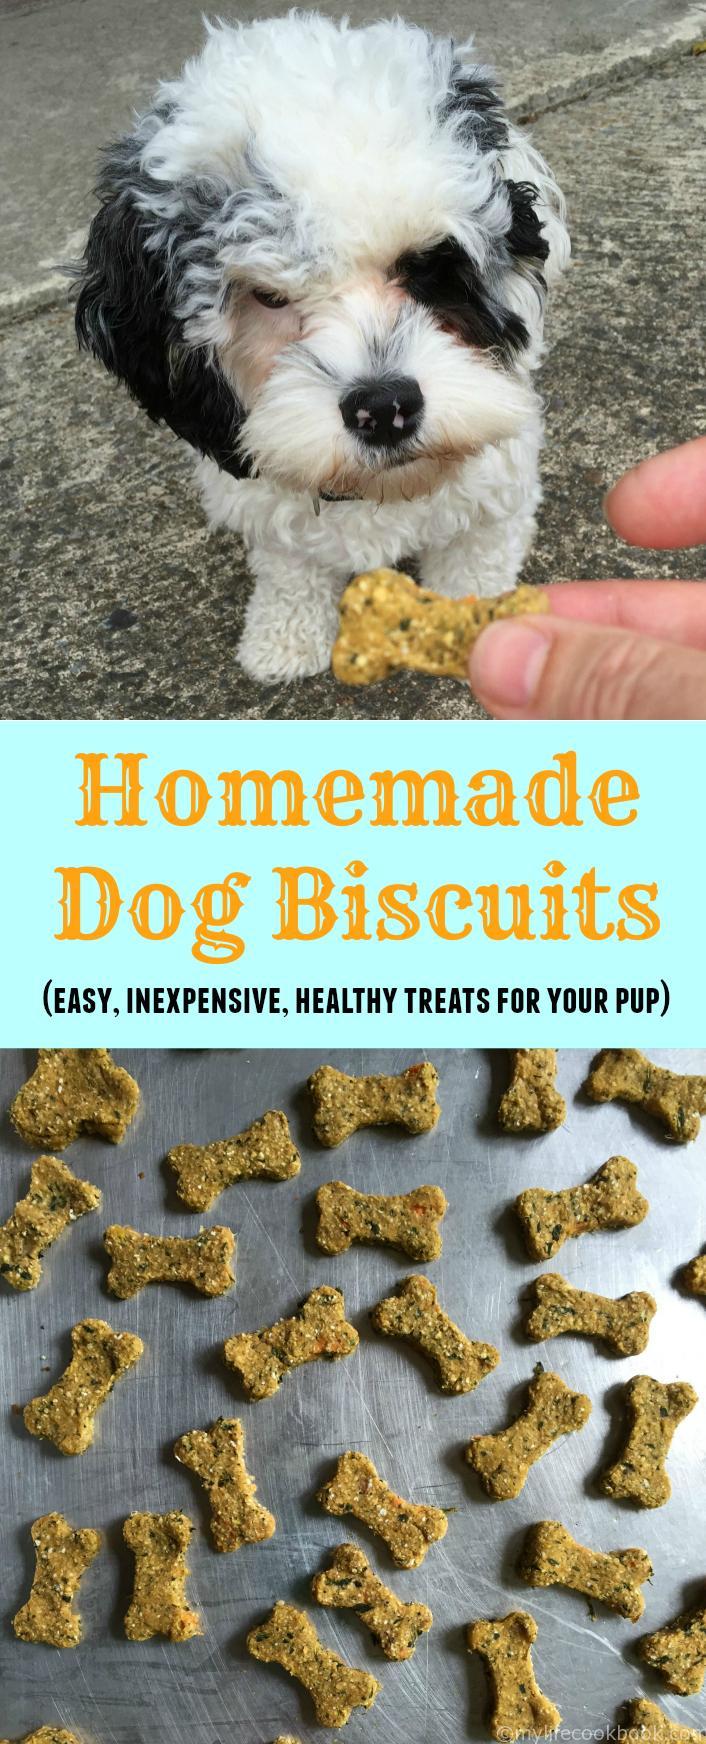 Best Inexpensive Dog Biscuits